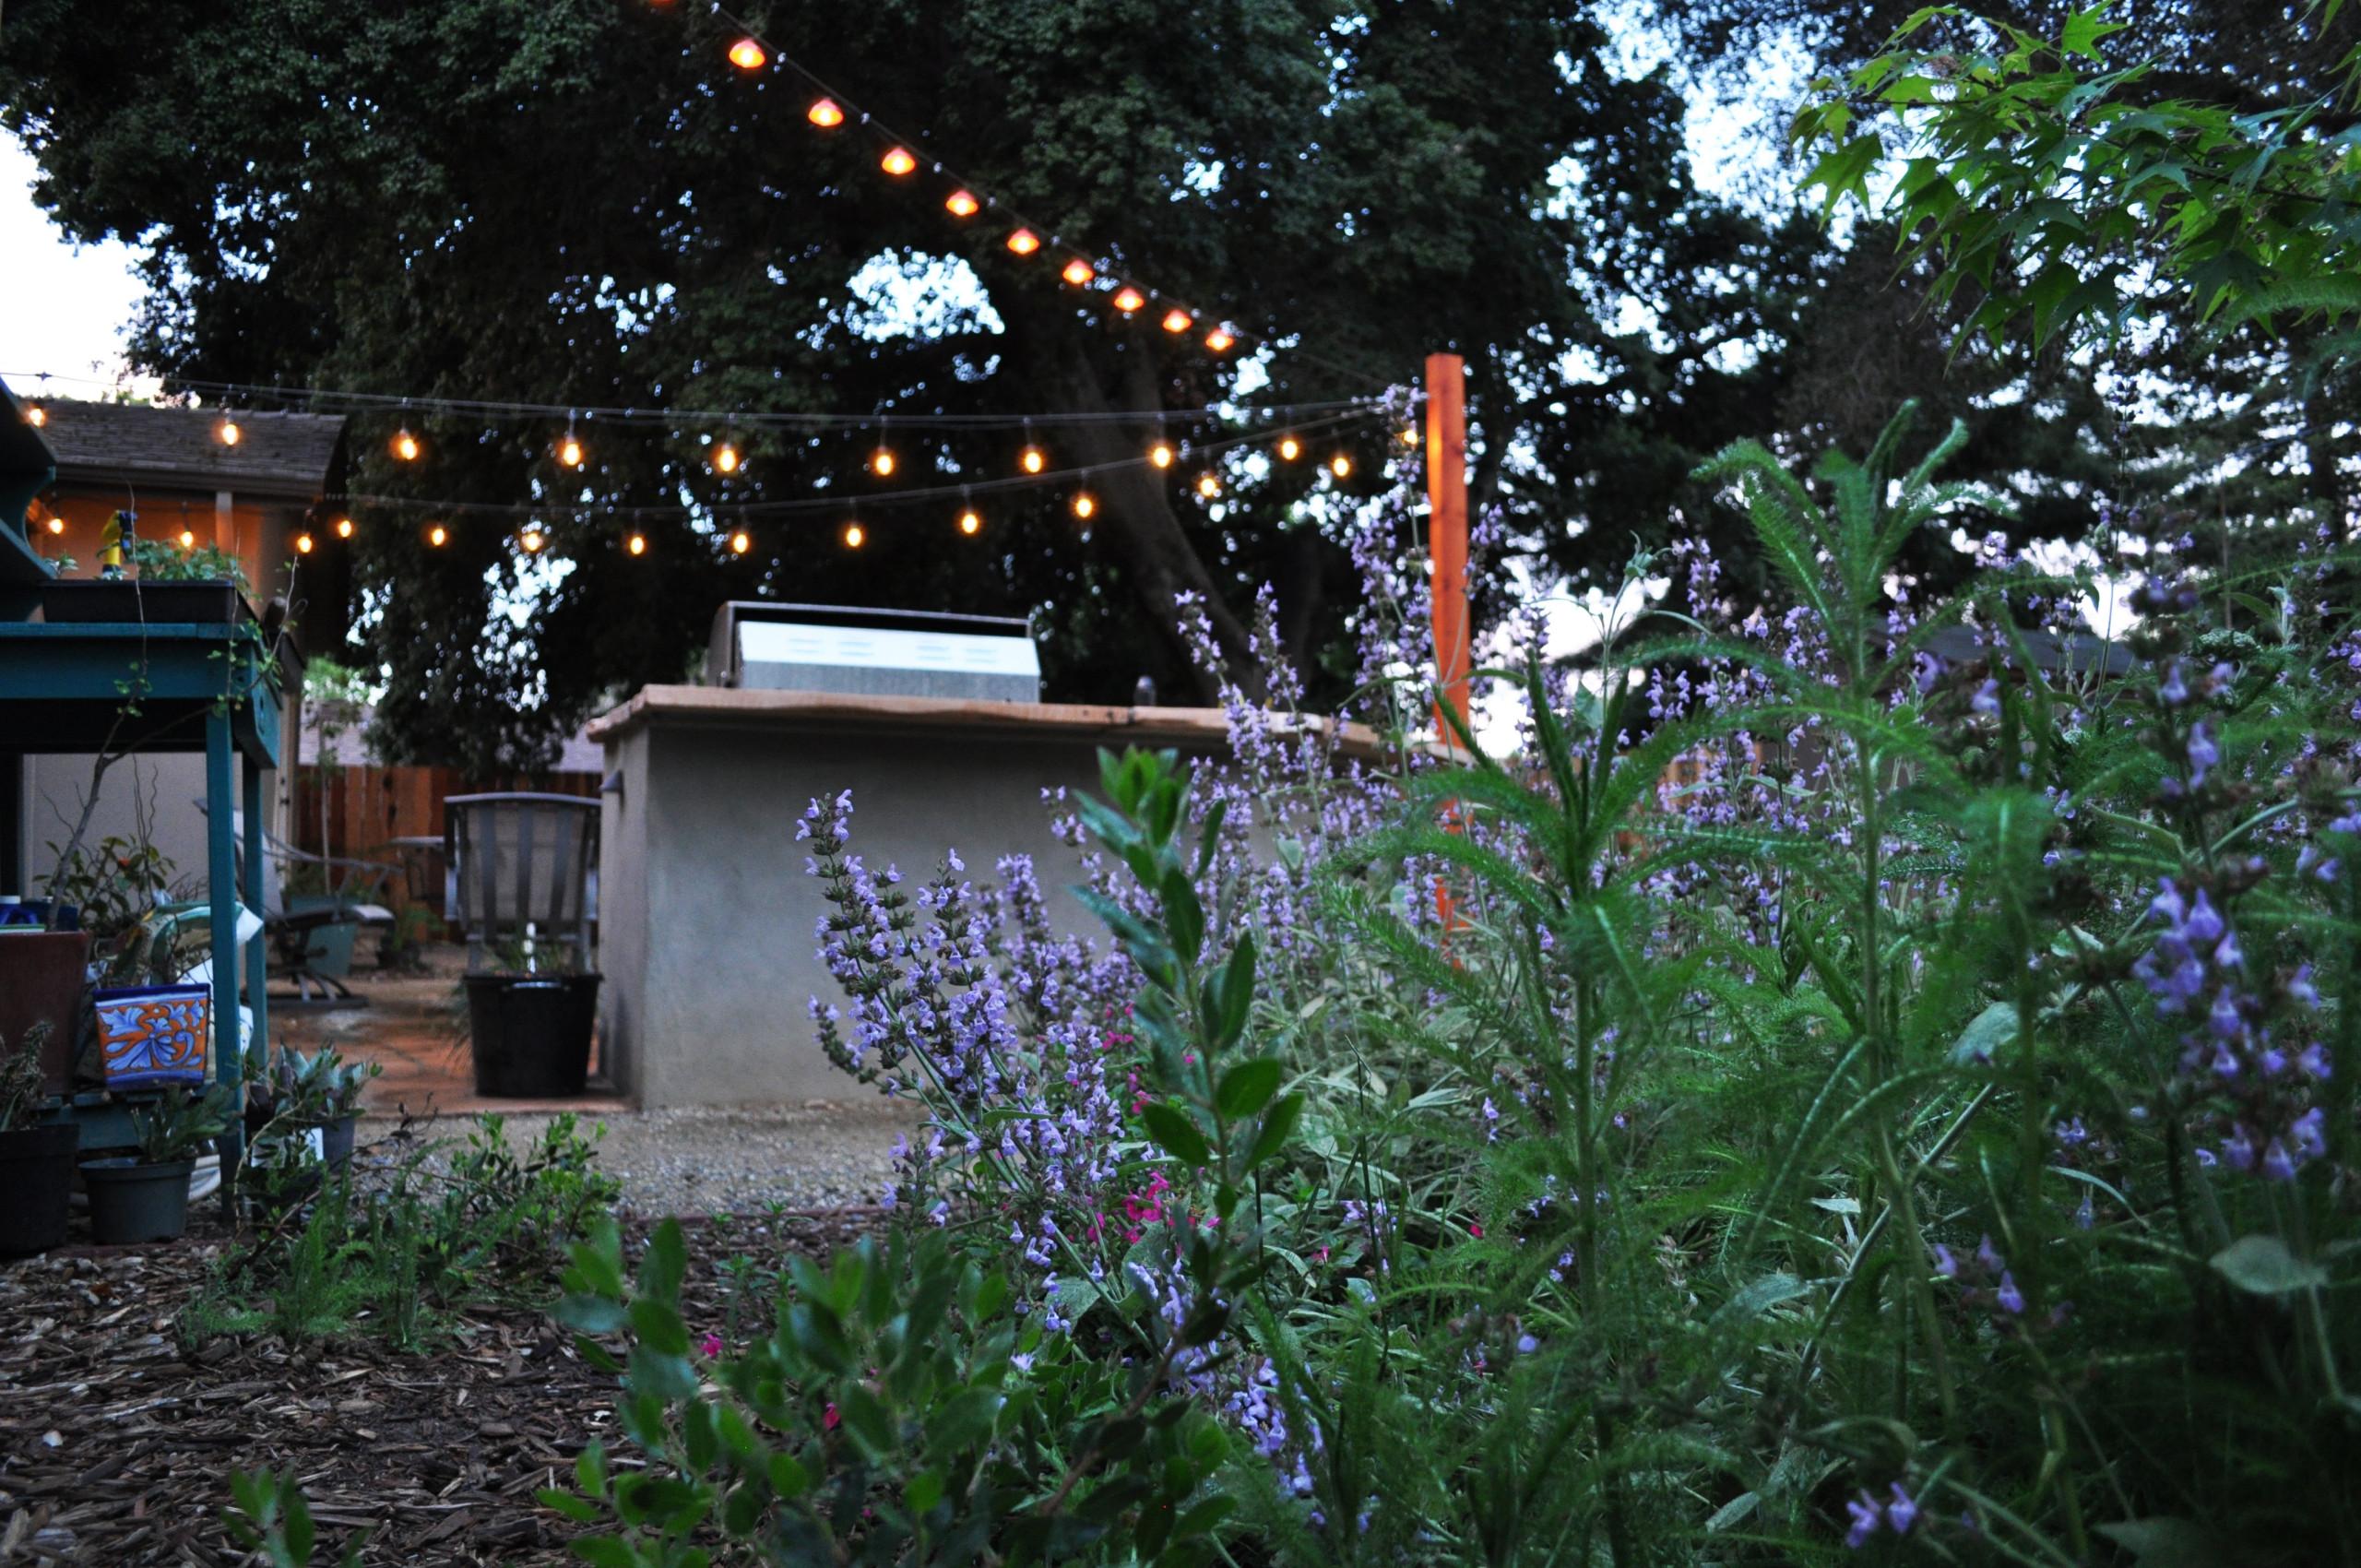 Cal Wild Backyard